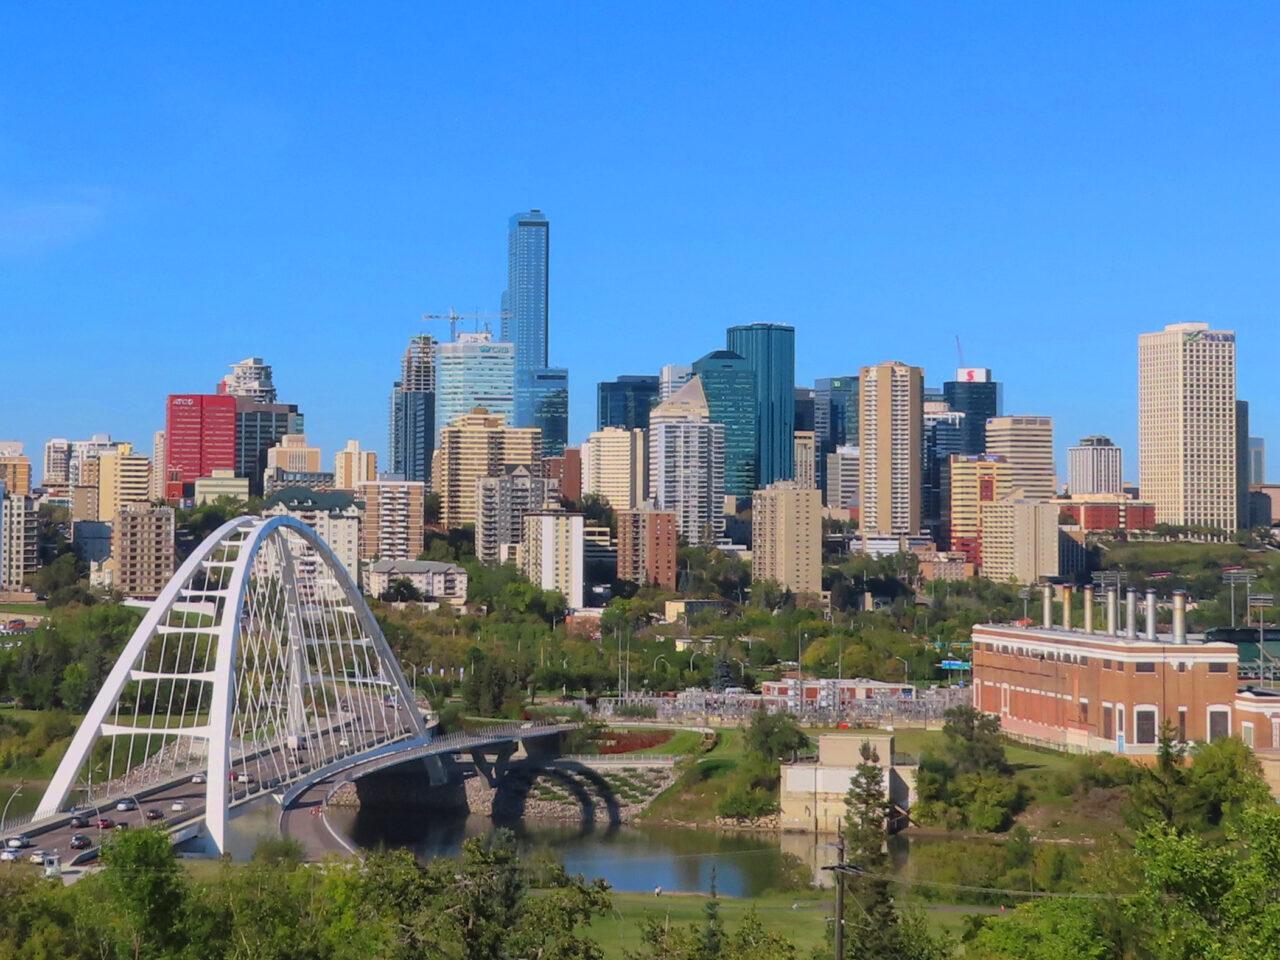 https://www.getmosaic.ca/wp-content/uploads/2021/06/Edmonton-Skyline-1280x960.jpg